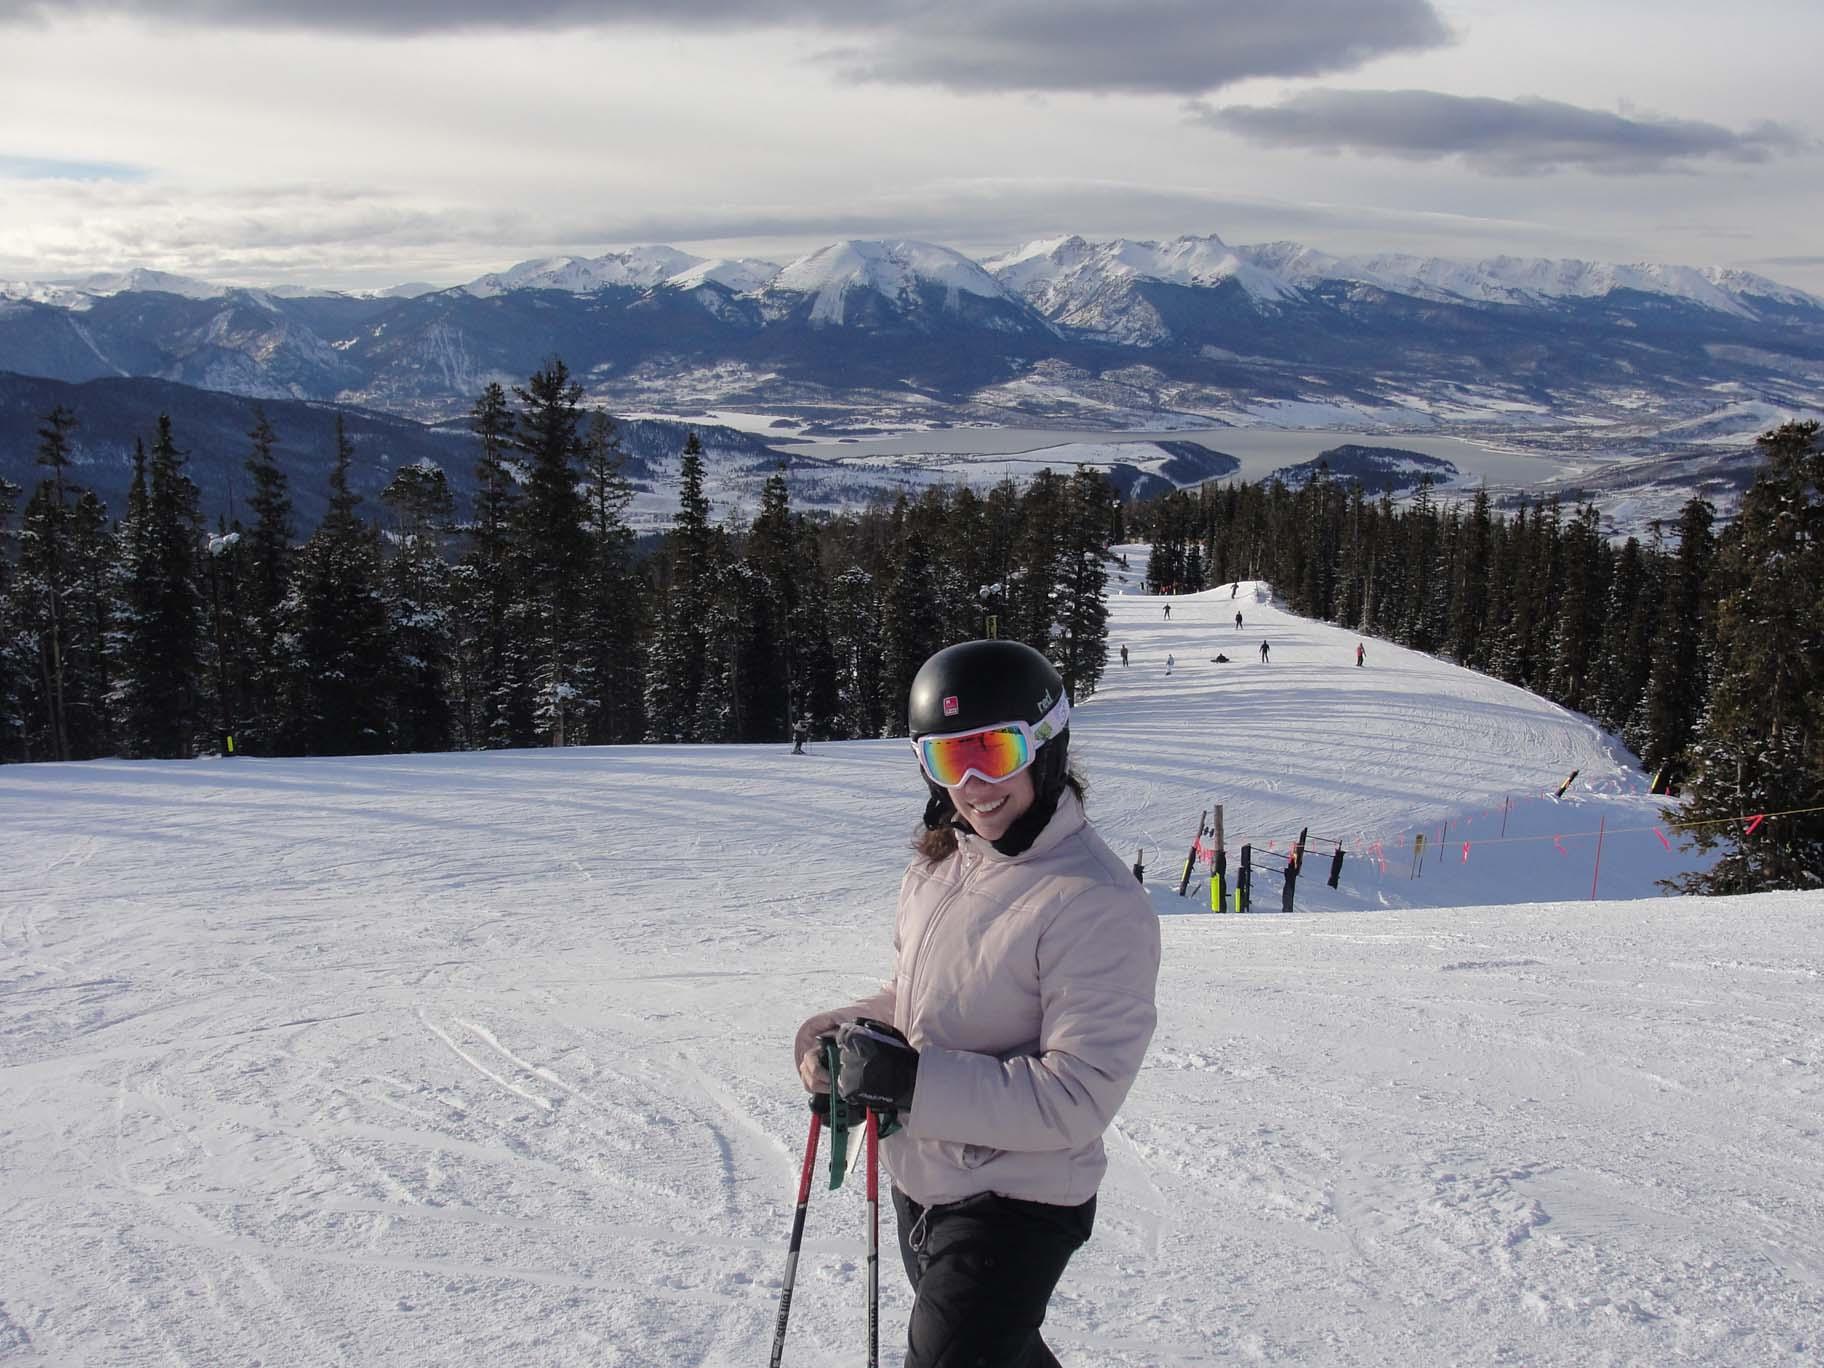 Emily skiing Schoolmarm in Keystone